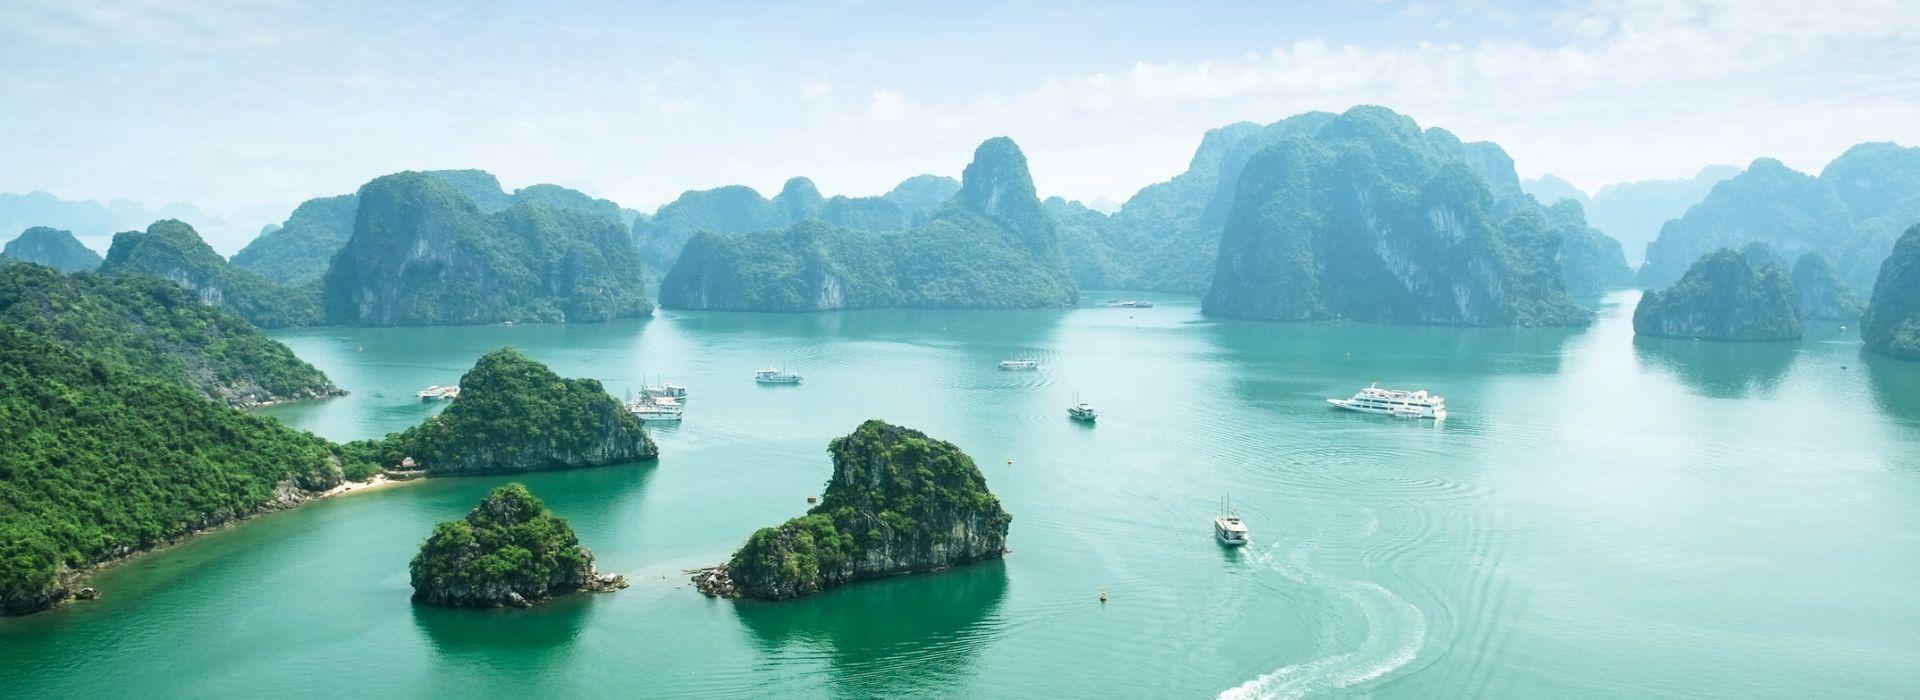 Natural landmarks sightseeing Tours in Hanoi